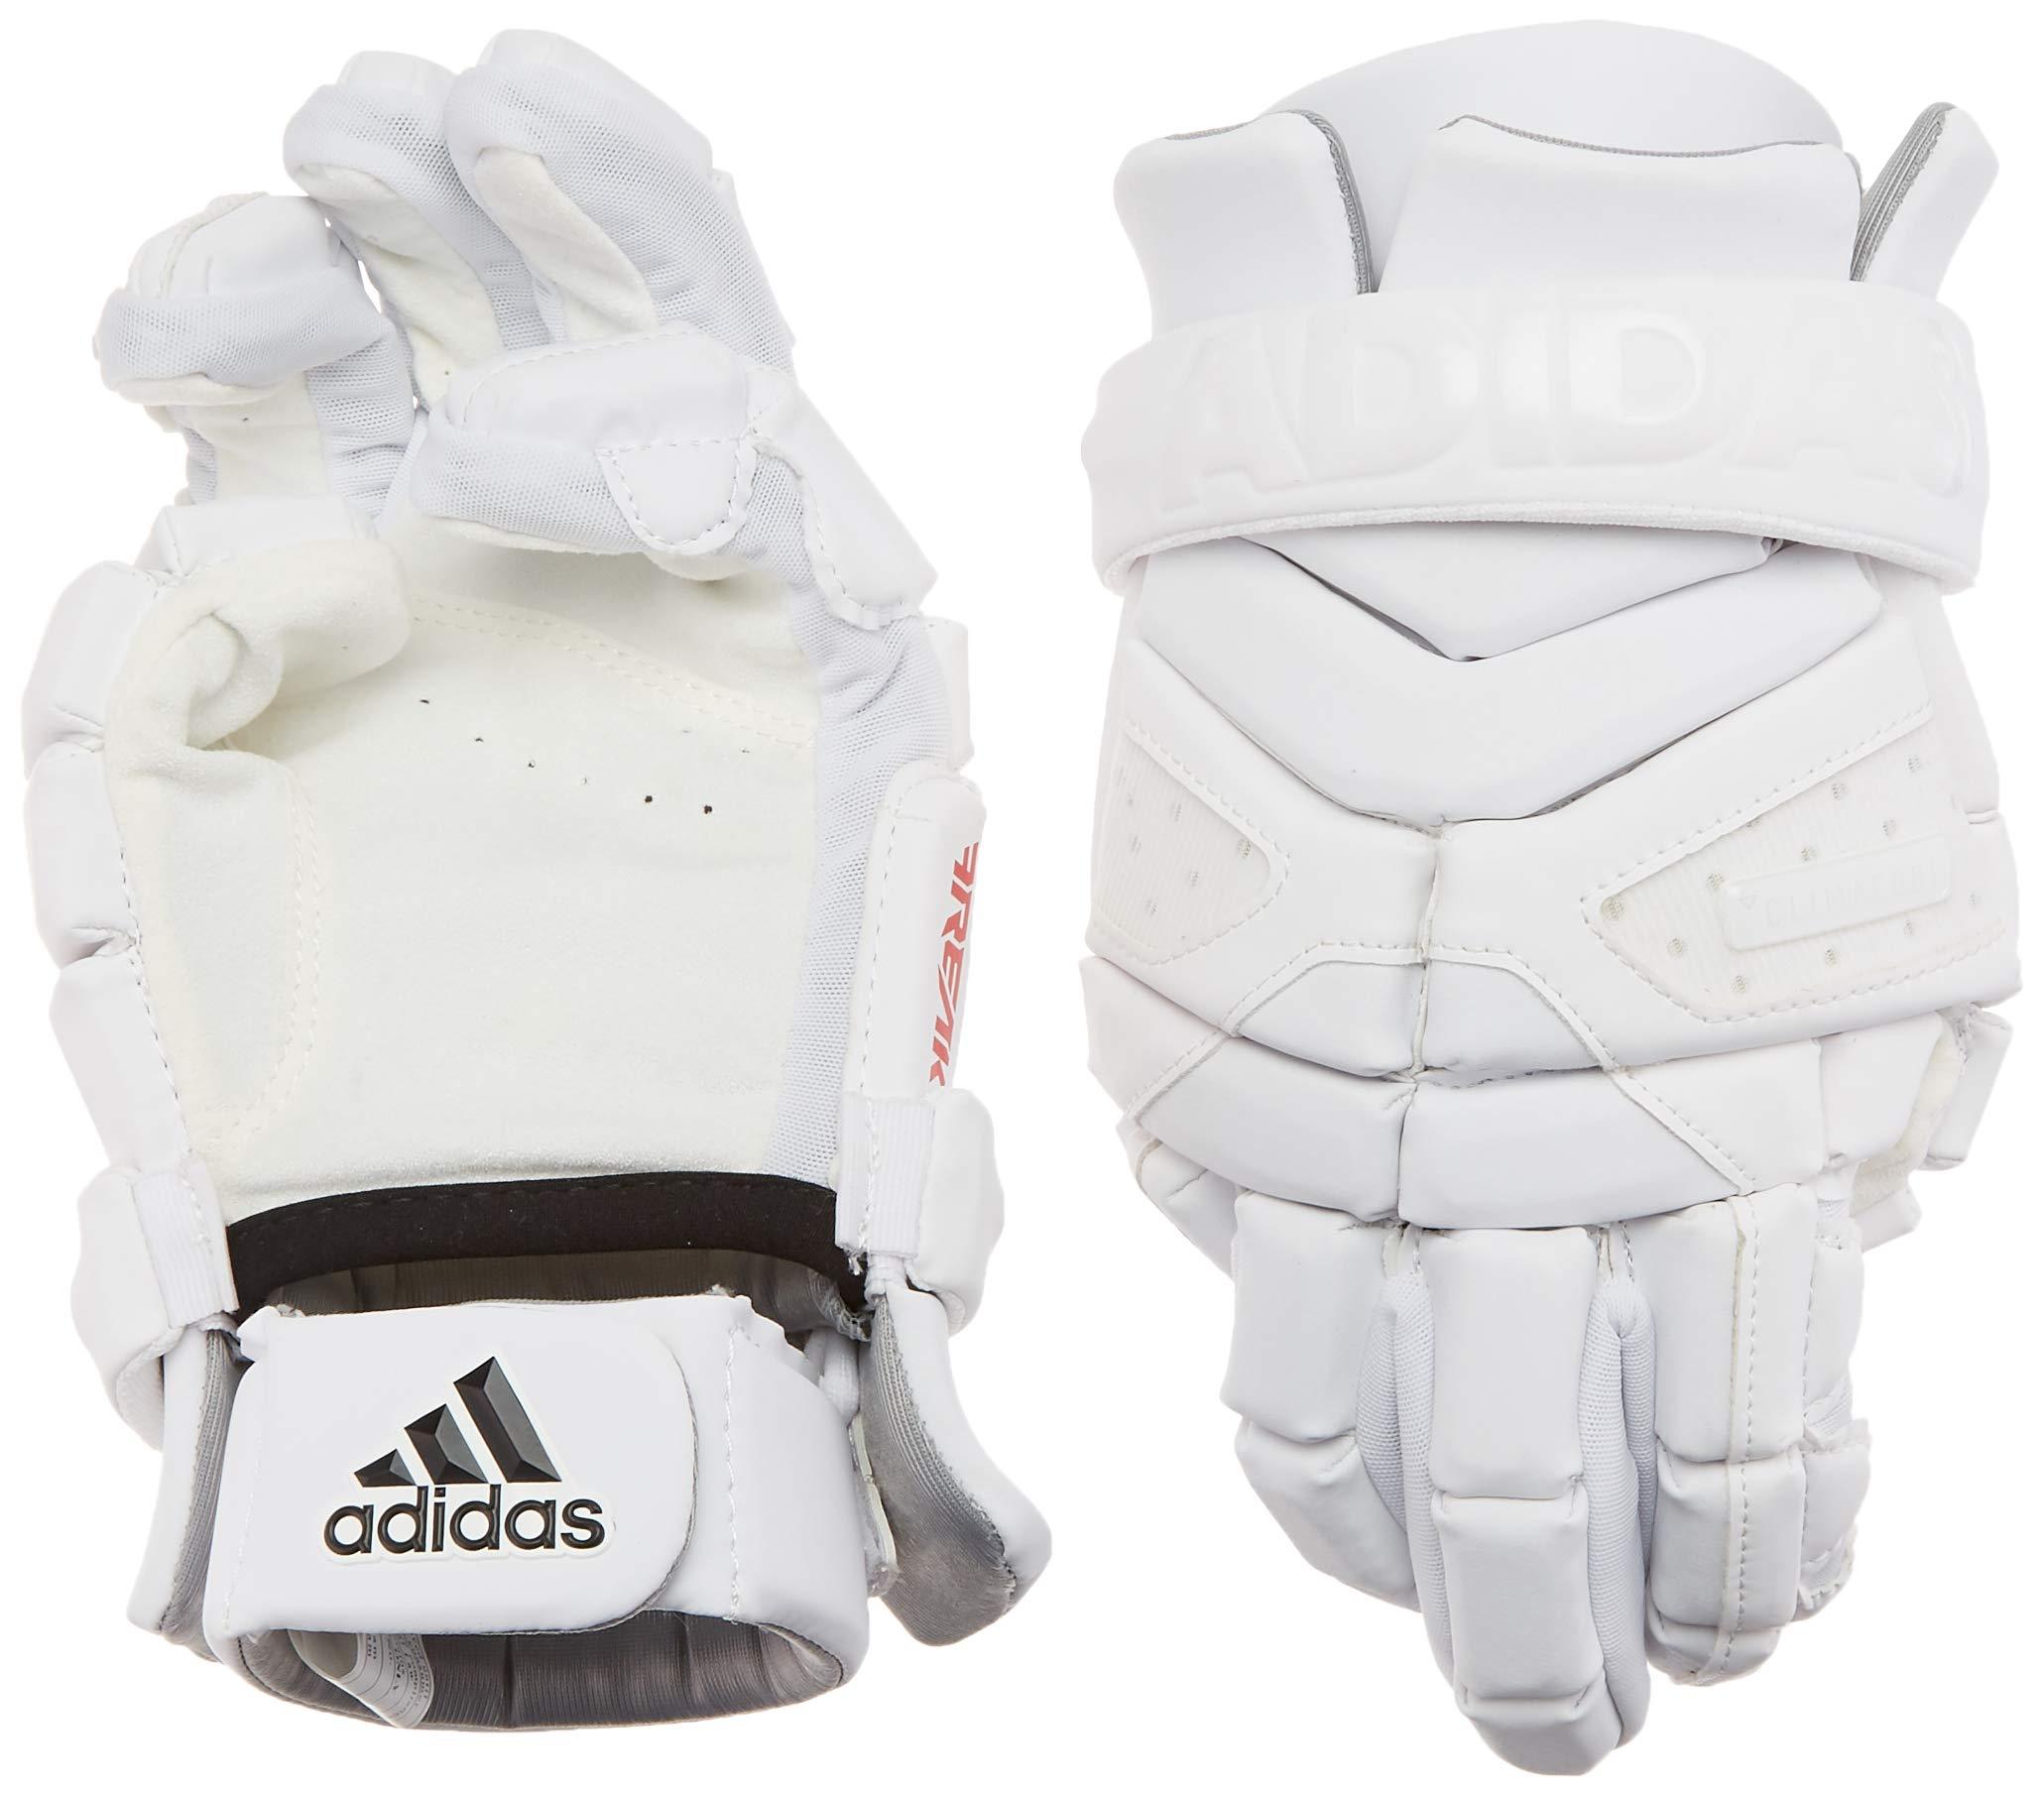 adidas Freak Lax Glove Dark Grey